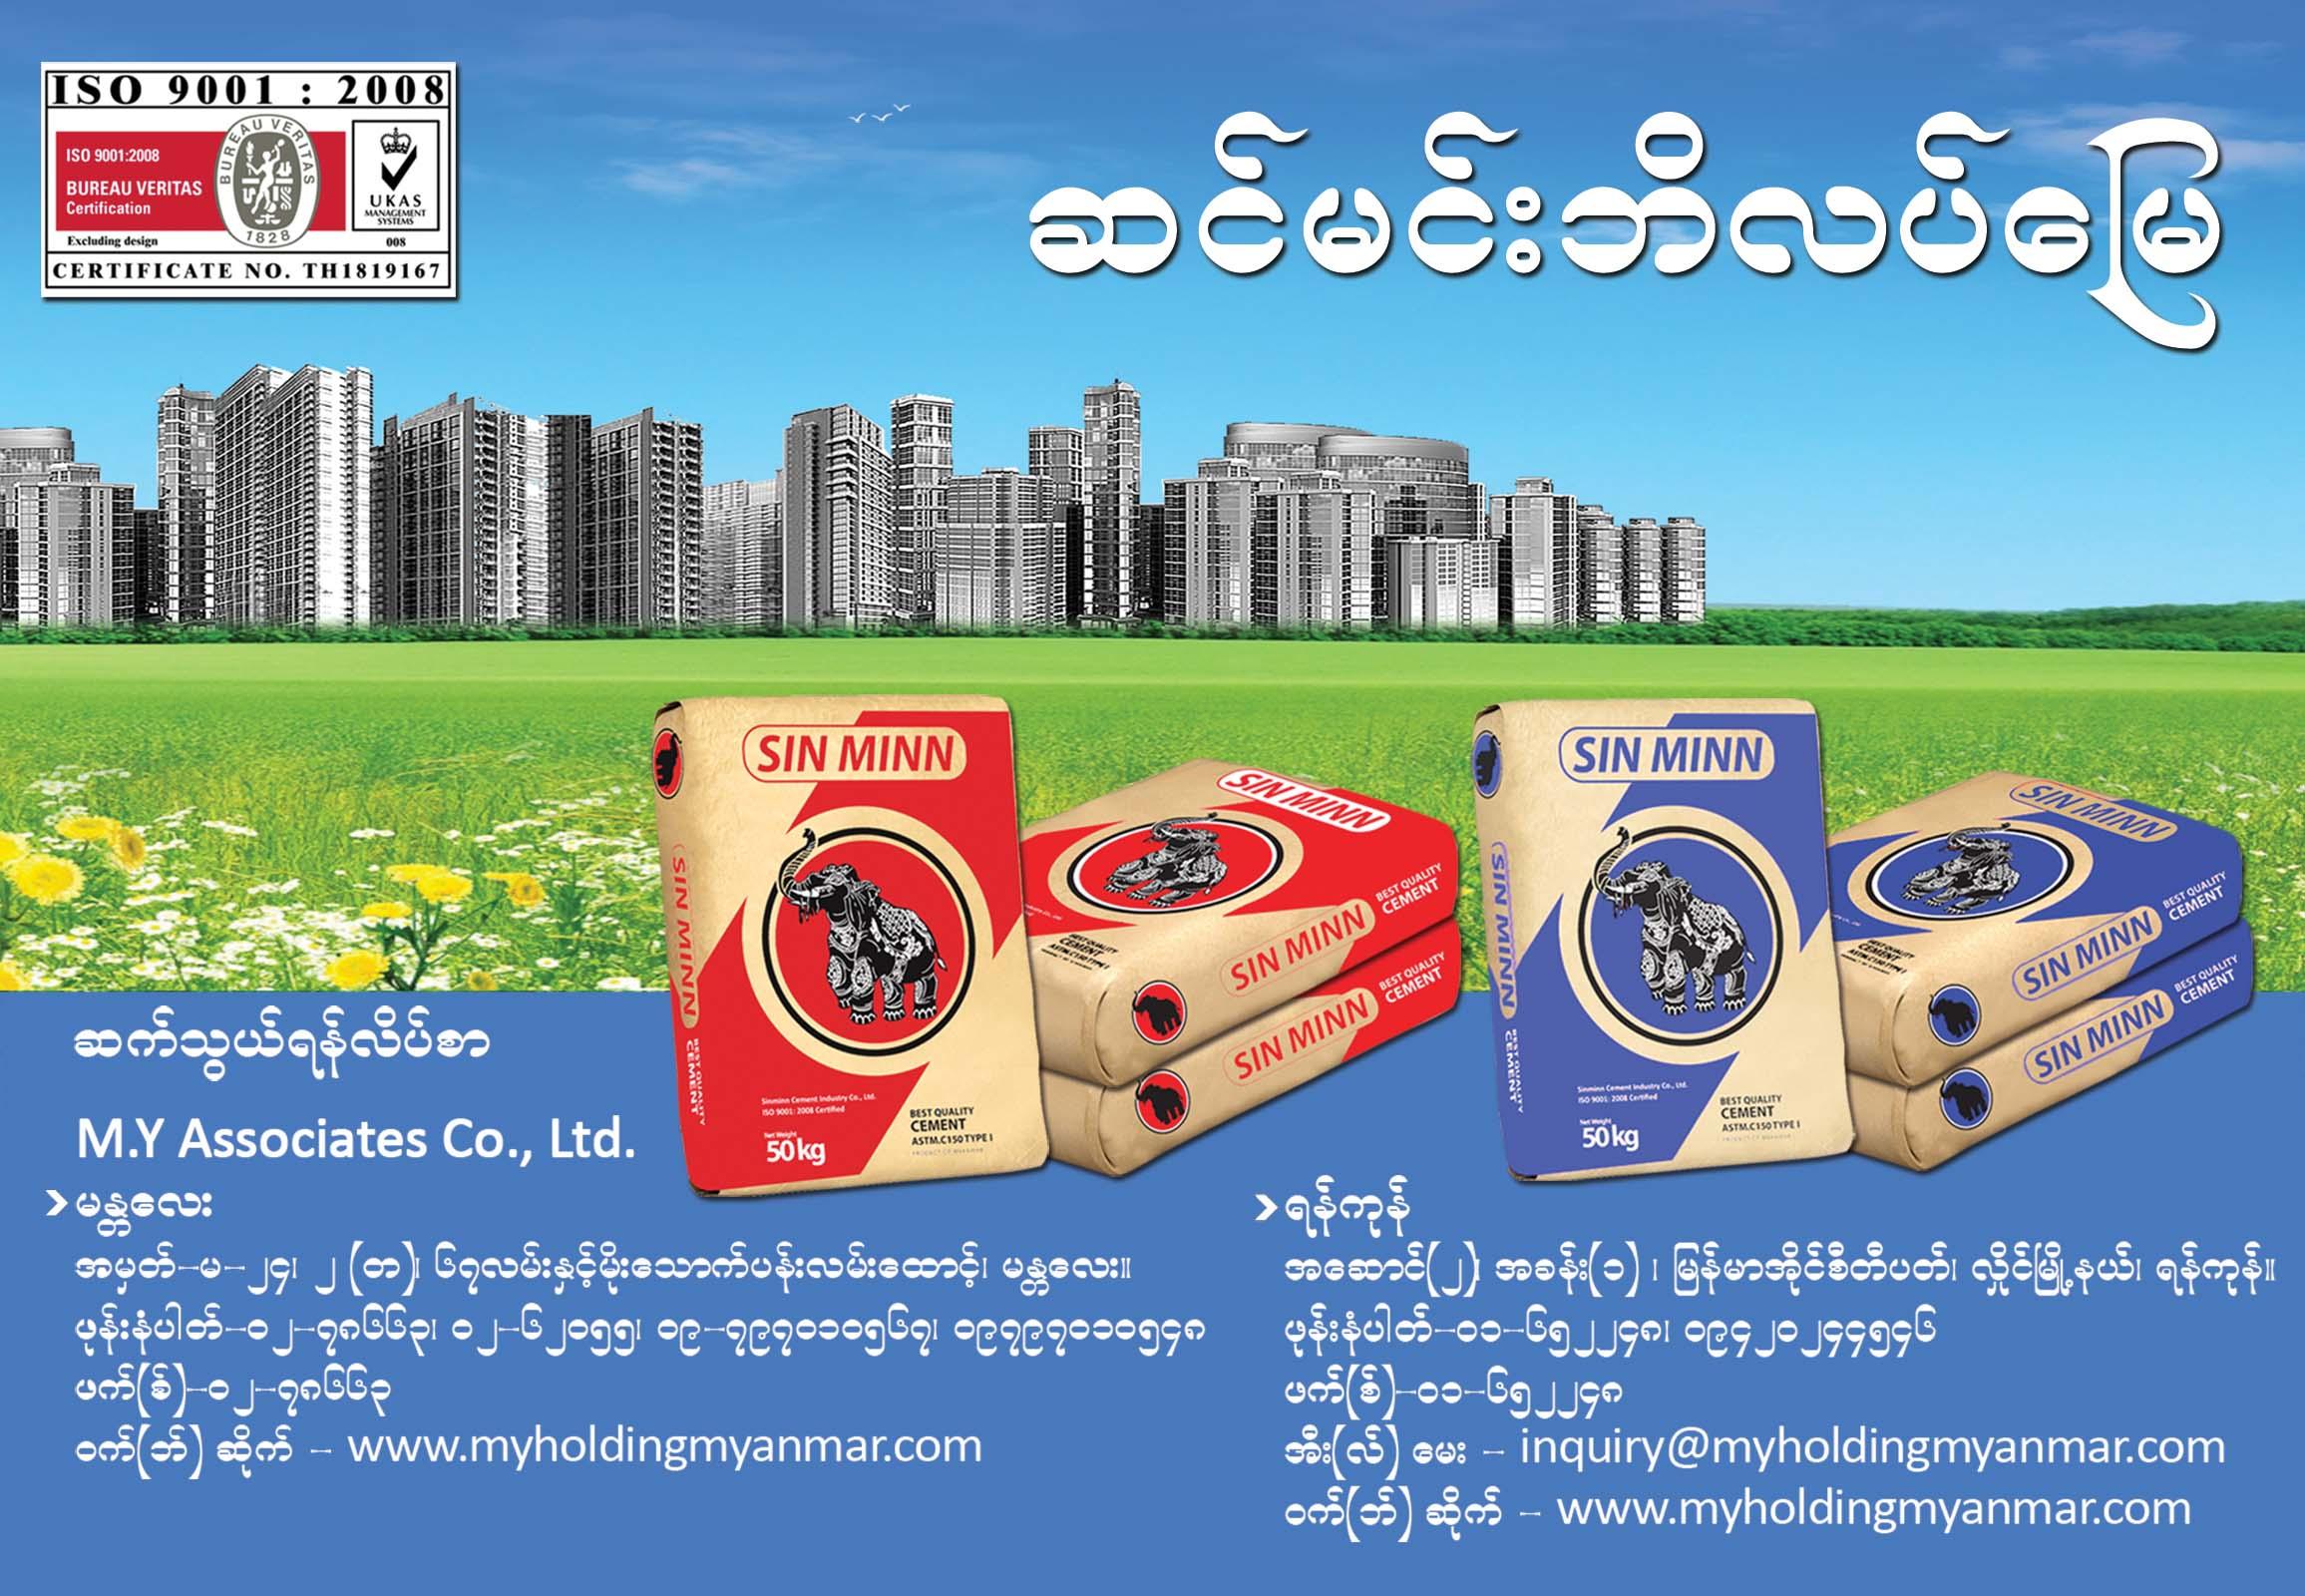 M.Y Associates Co., Ltd. (Sin Min Cement)